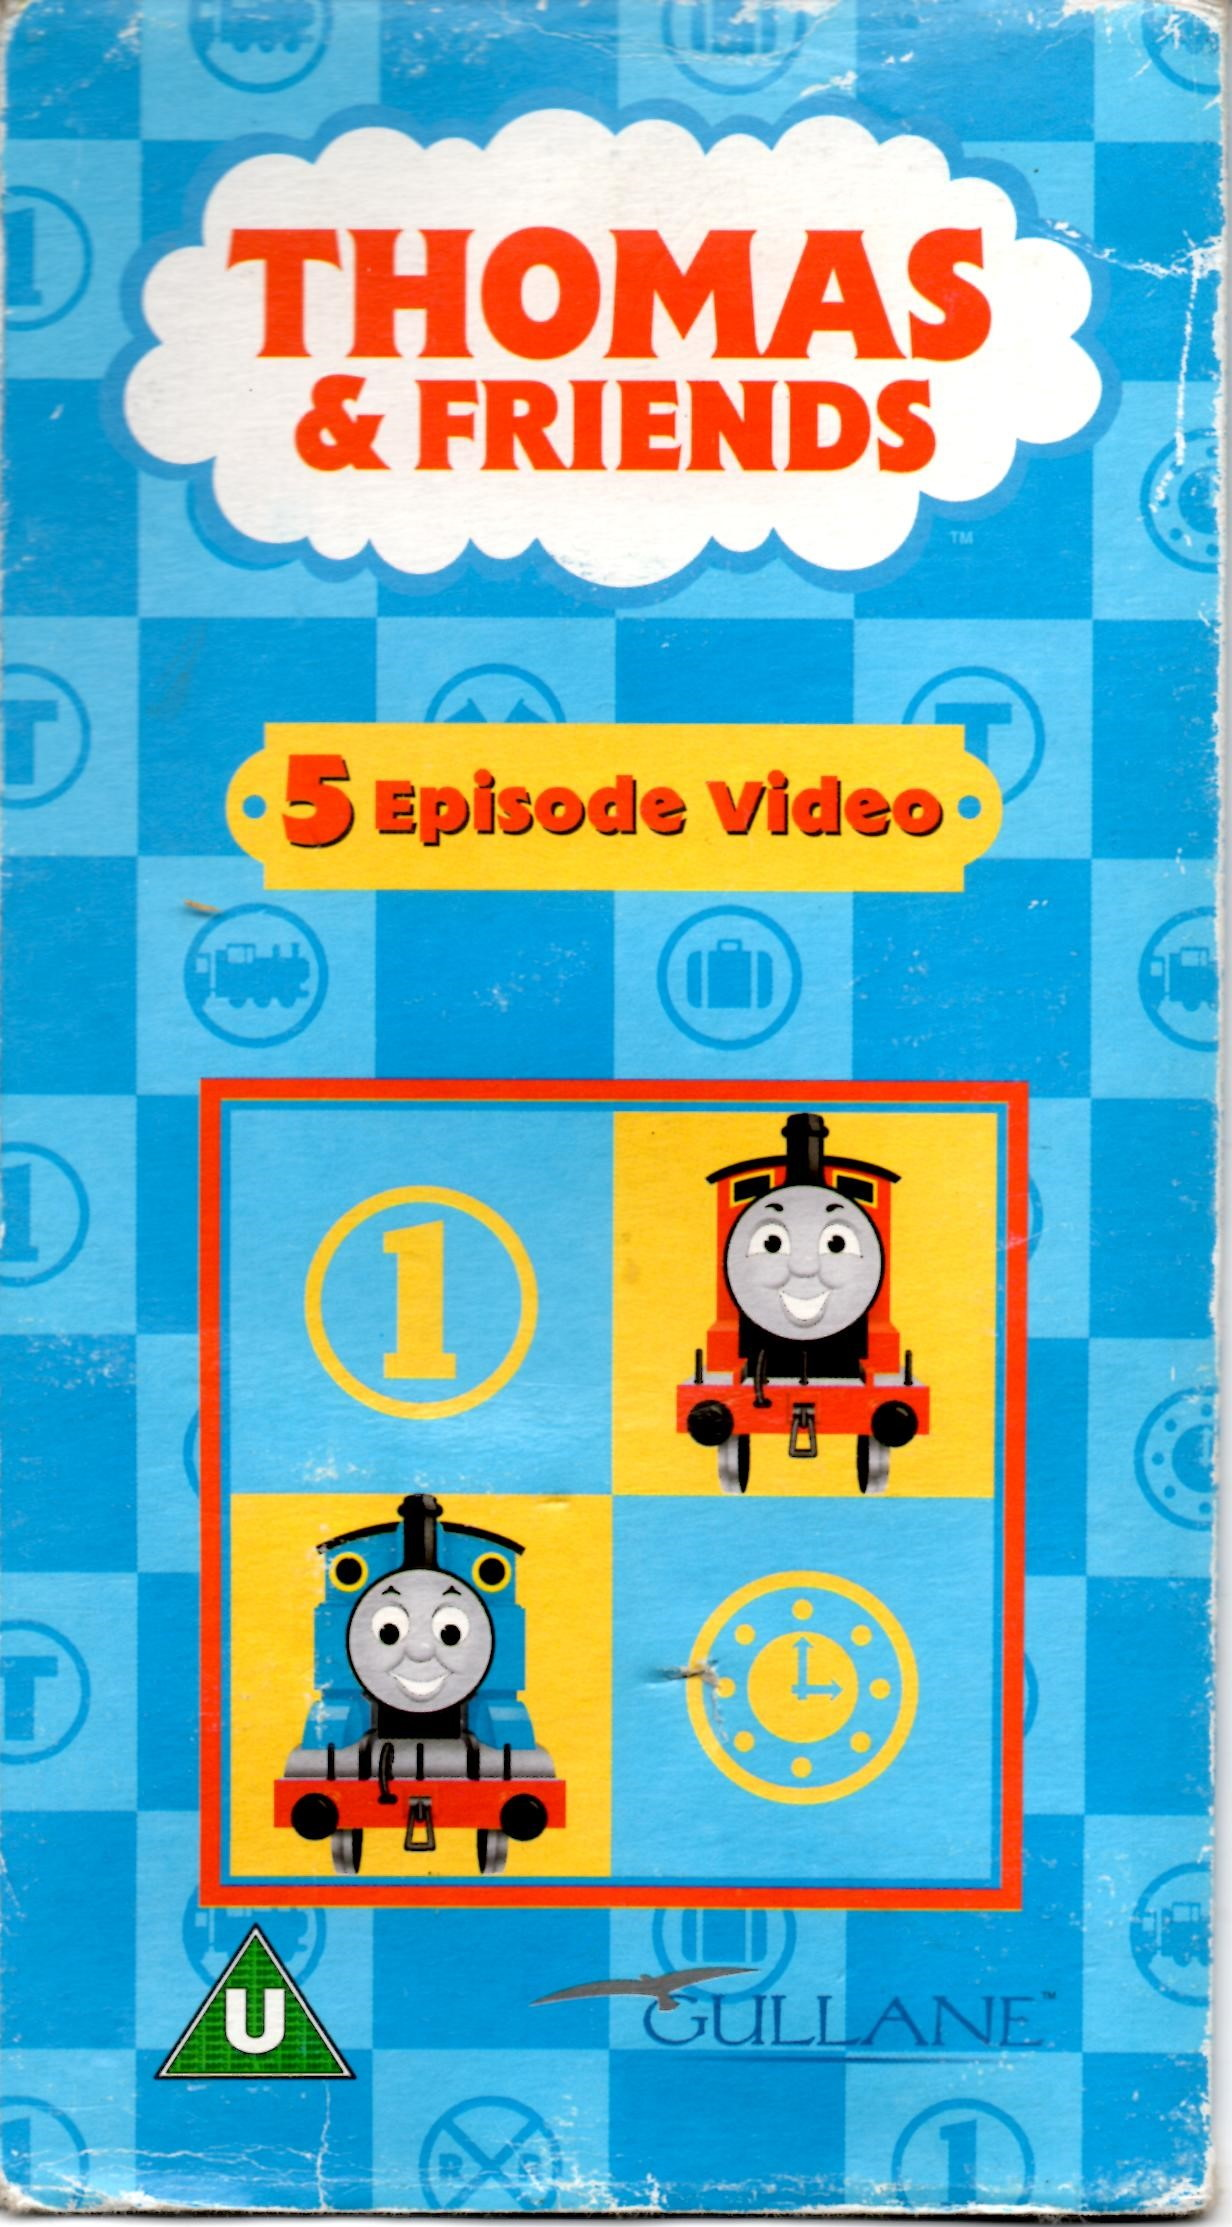 5 Episode Video